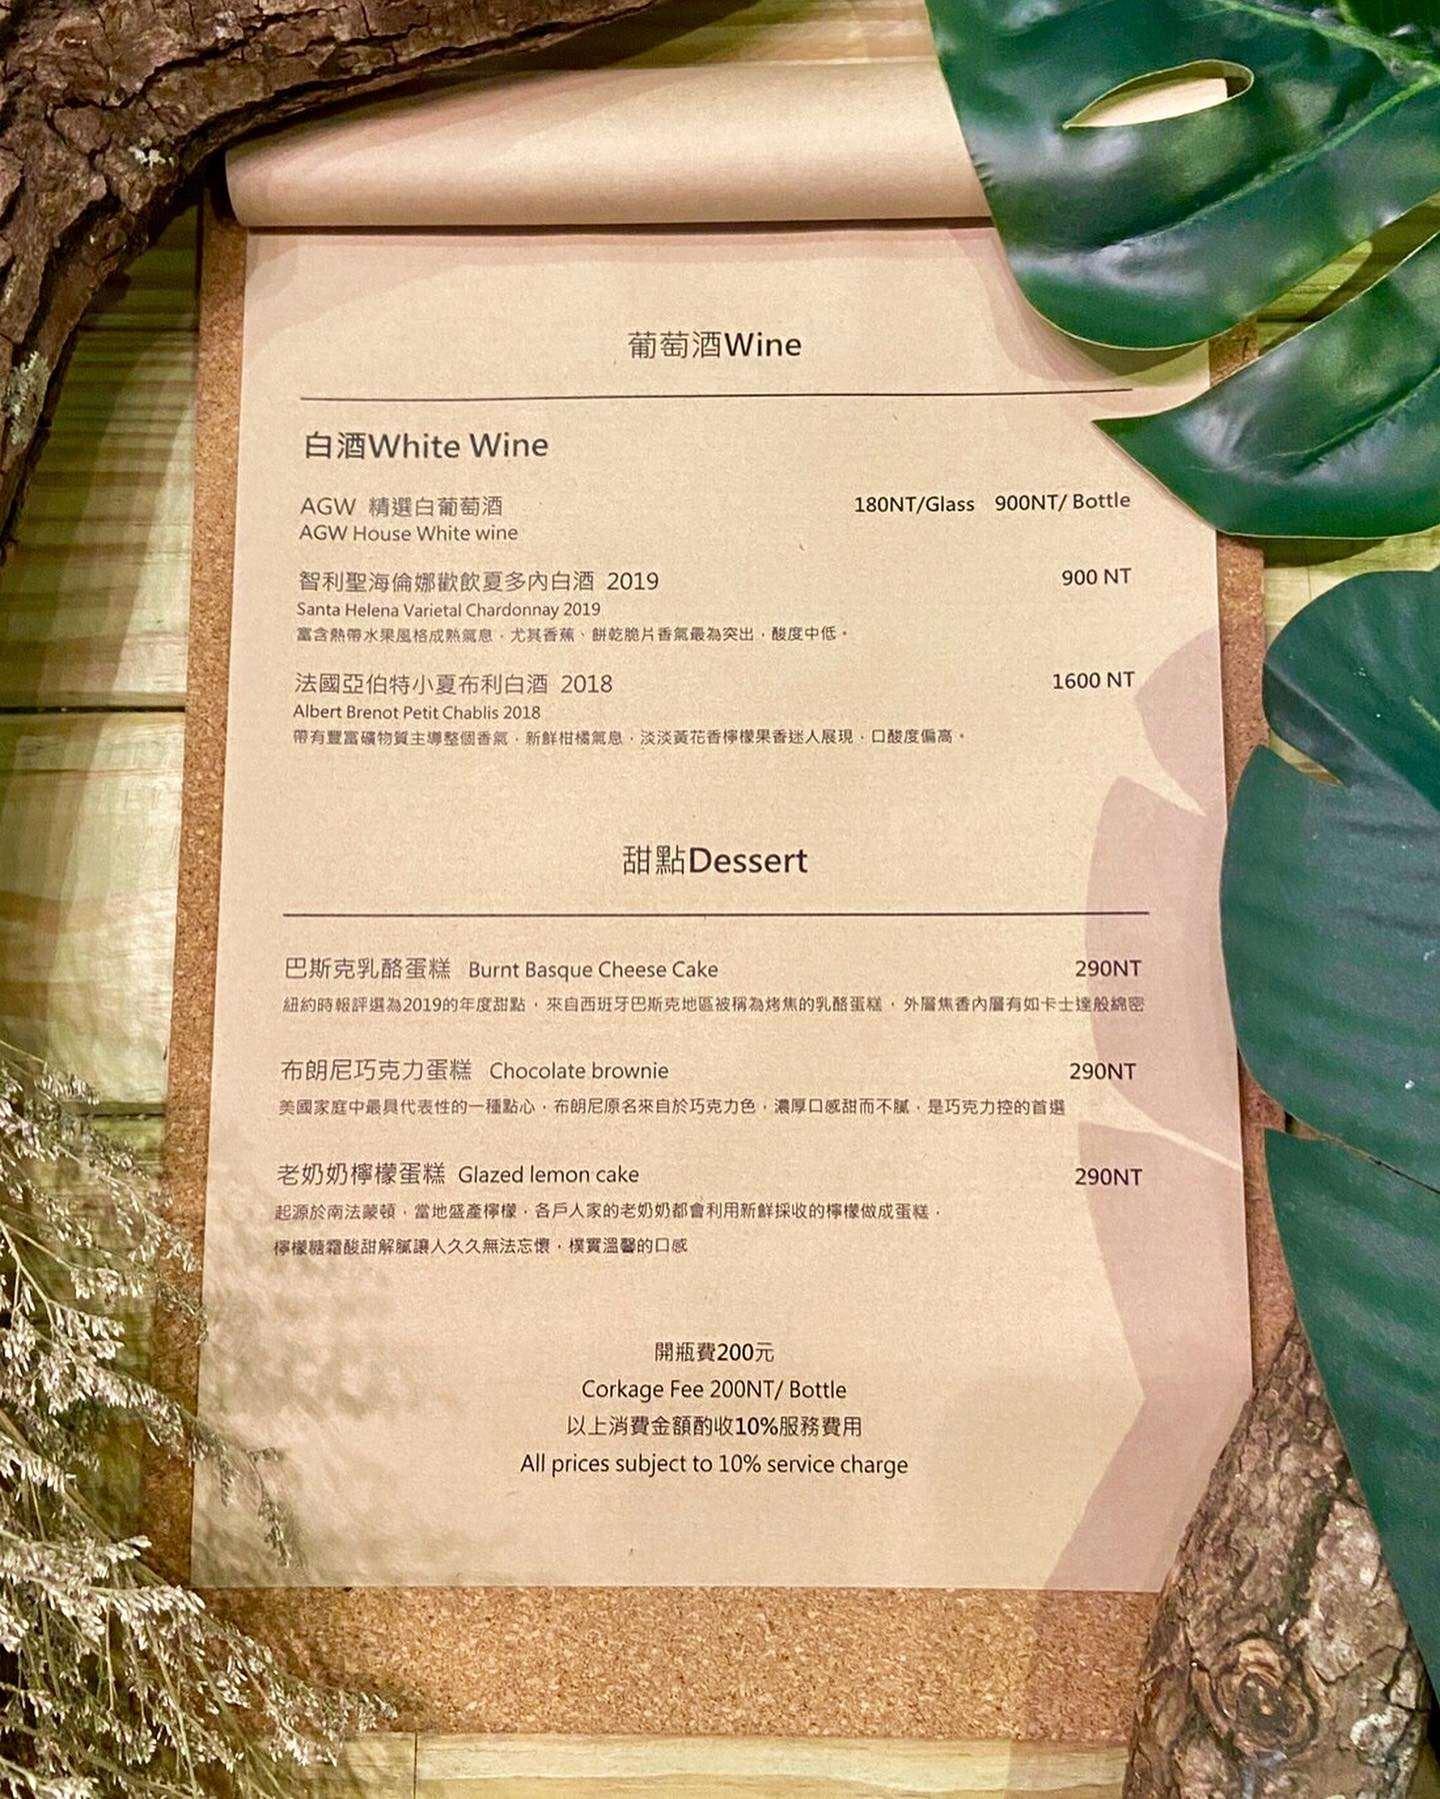 AGW Restaurant。高雄原肉柴燒的私房料理|薩索雞、翼板牛排、櫻桃鴨胸好好食